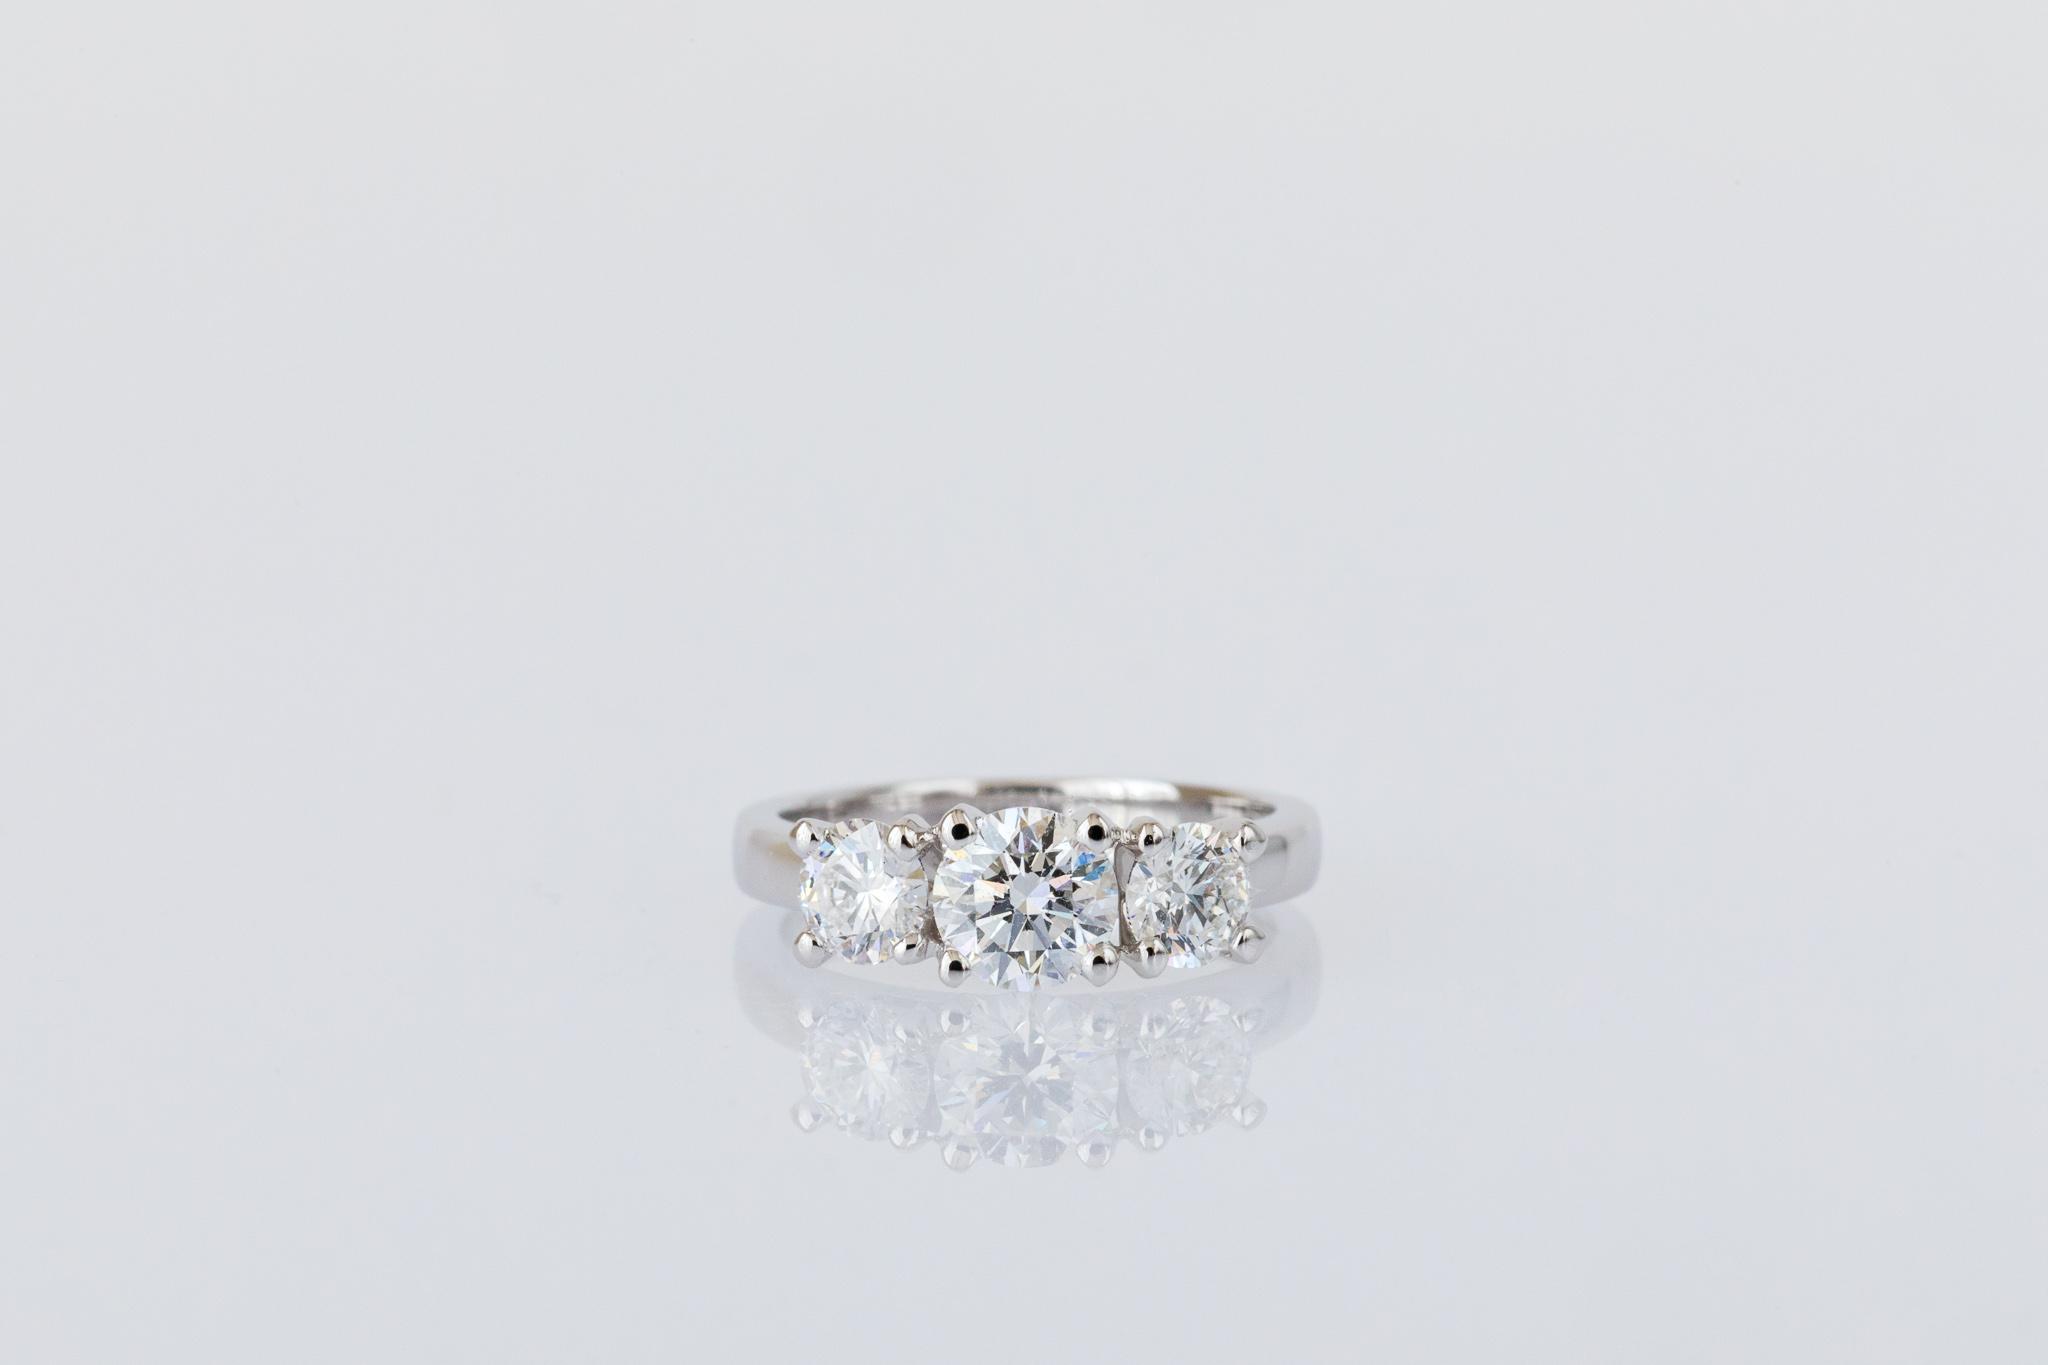 White gold three stone engagement ring.